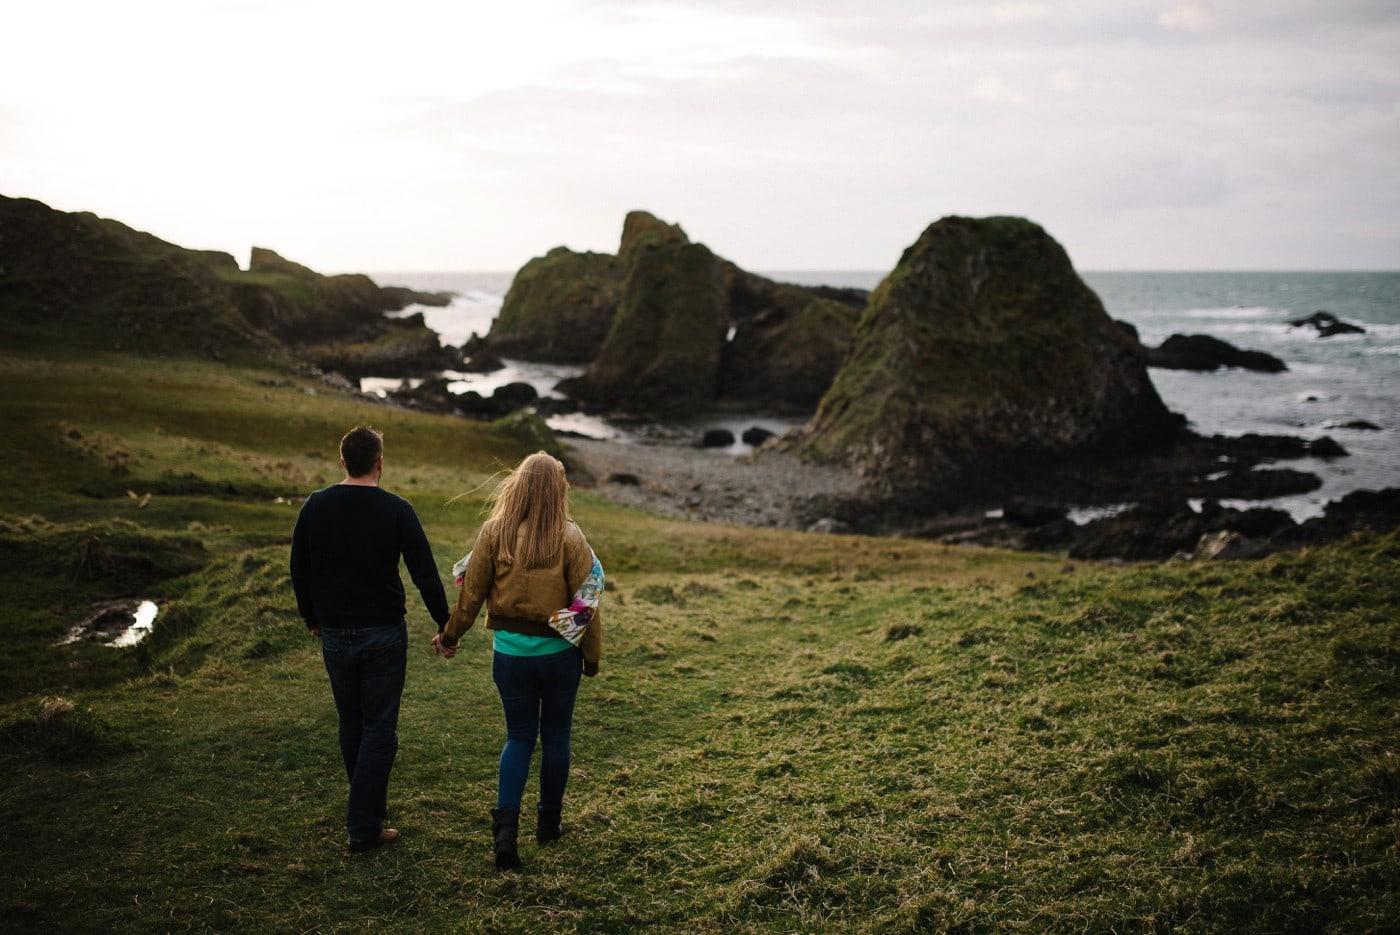 ballintoy-harbour-engagement-wedding-photographer-northern-ireland_0015